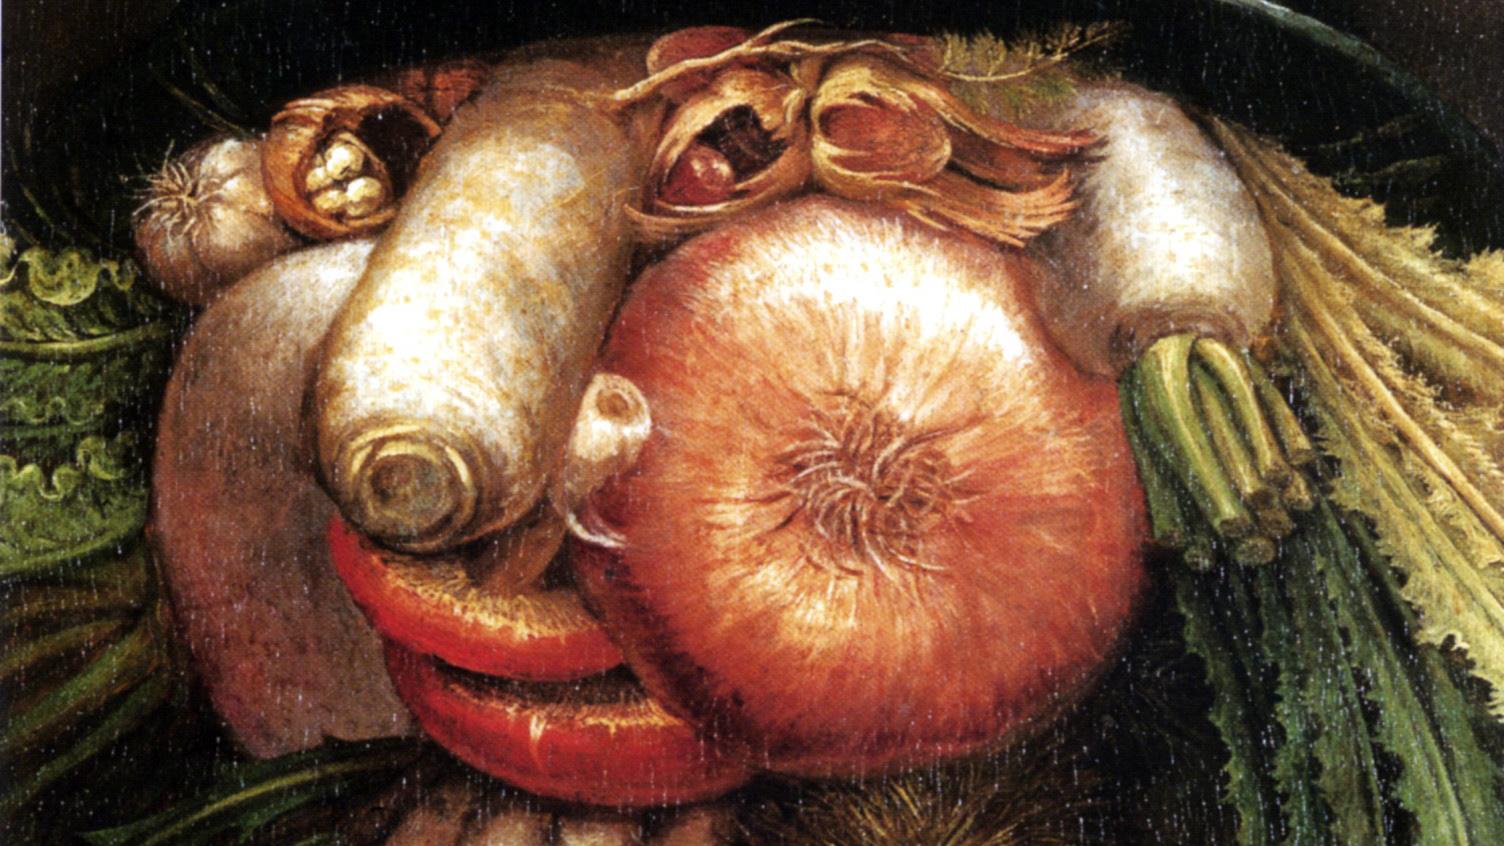 Giuseppe Arcimboldo - Portrait with Vegetables (The Green Grocer)